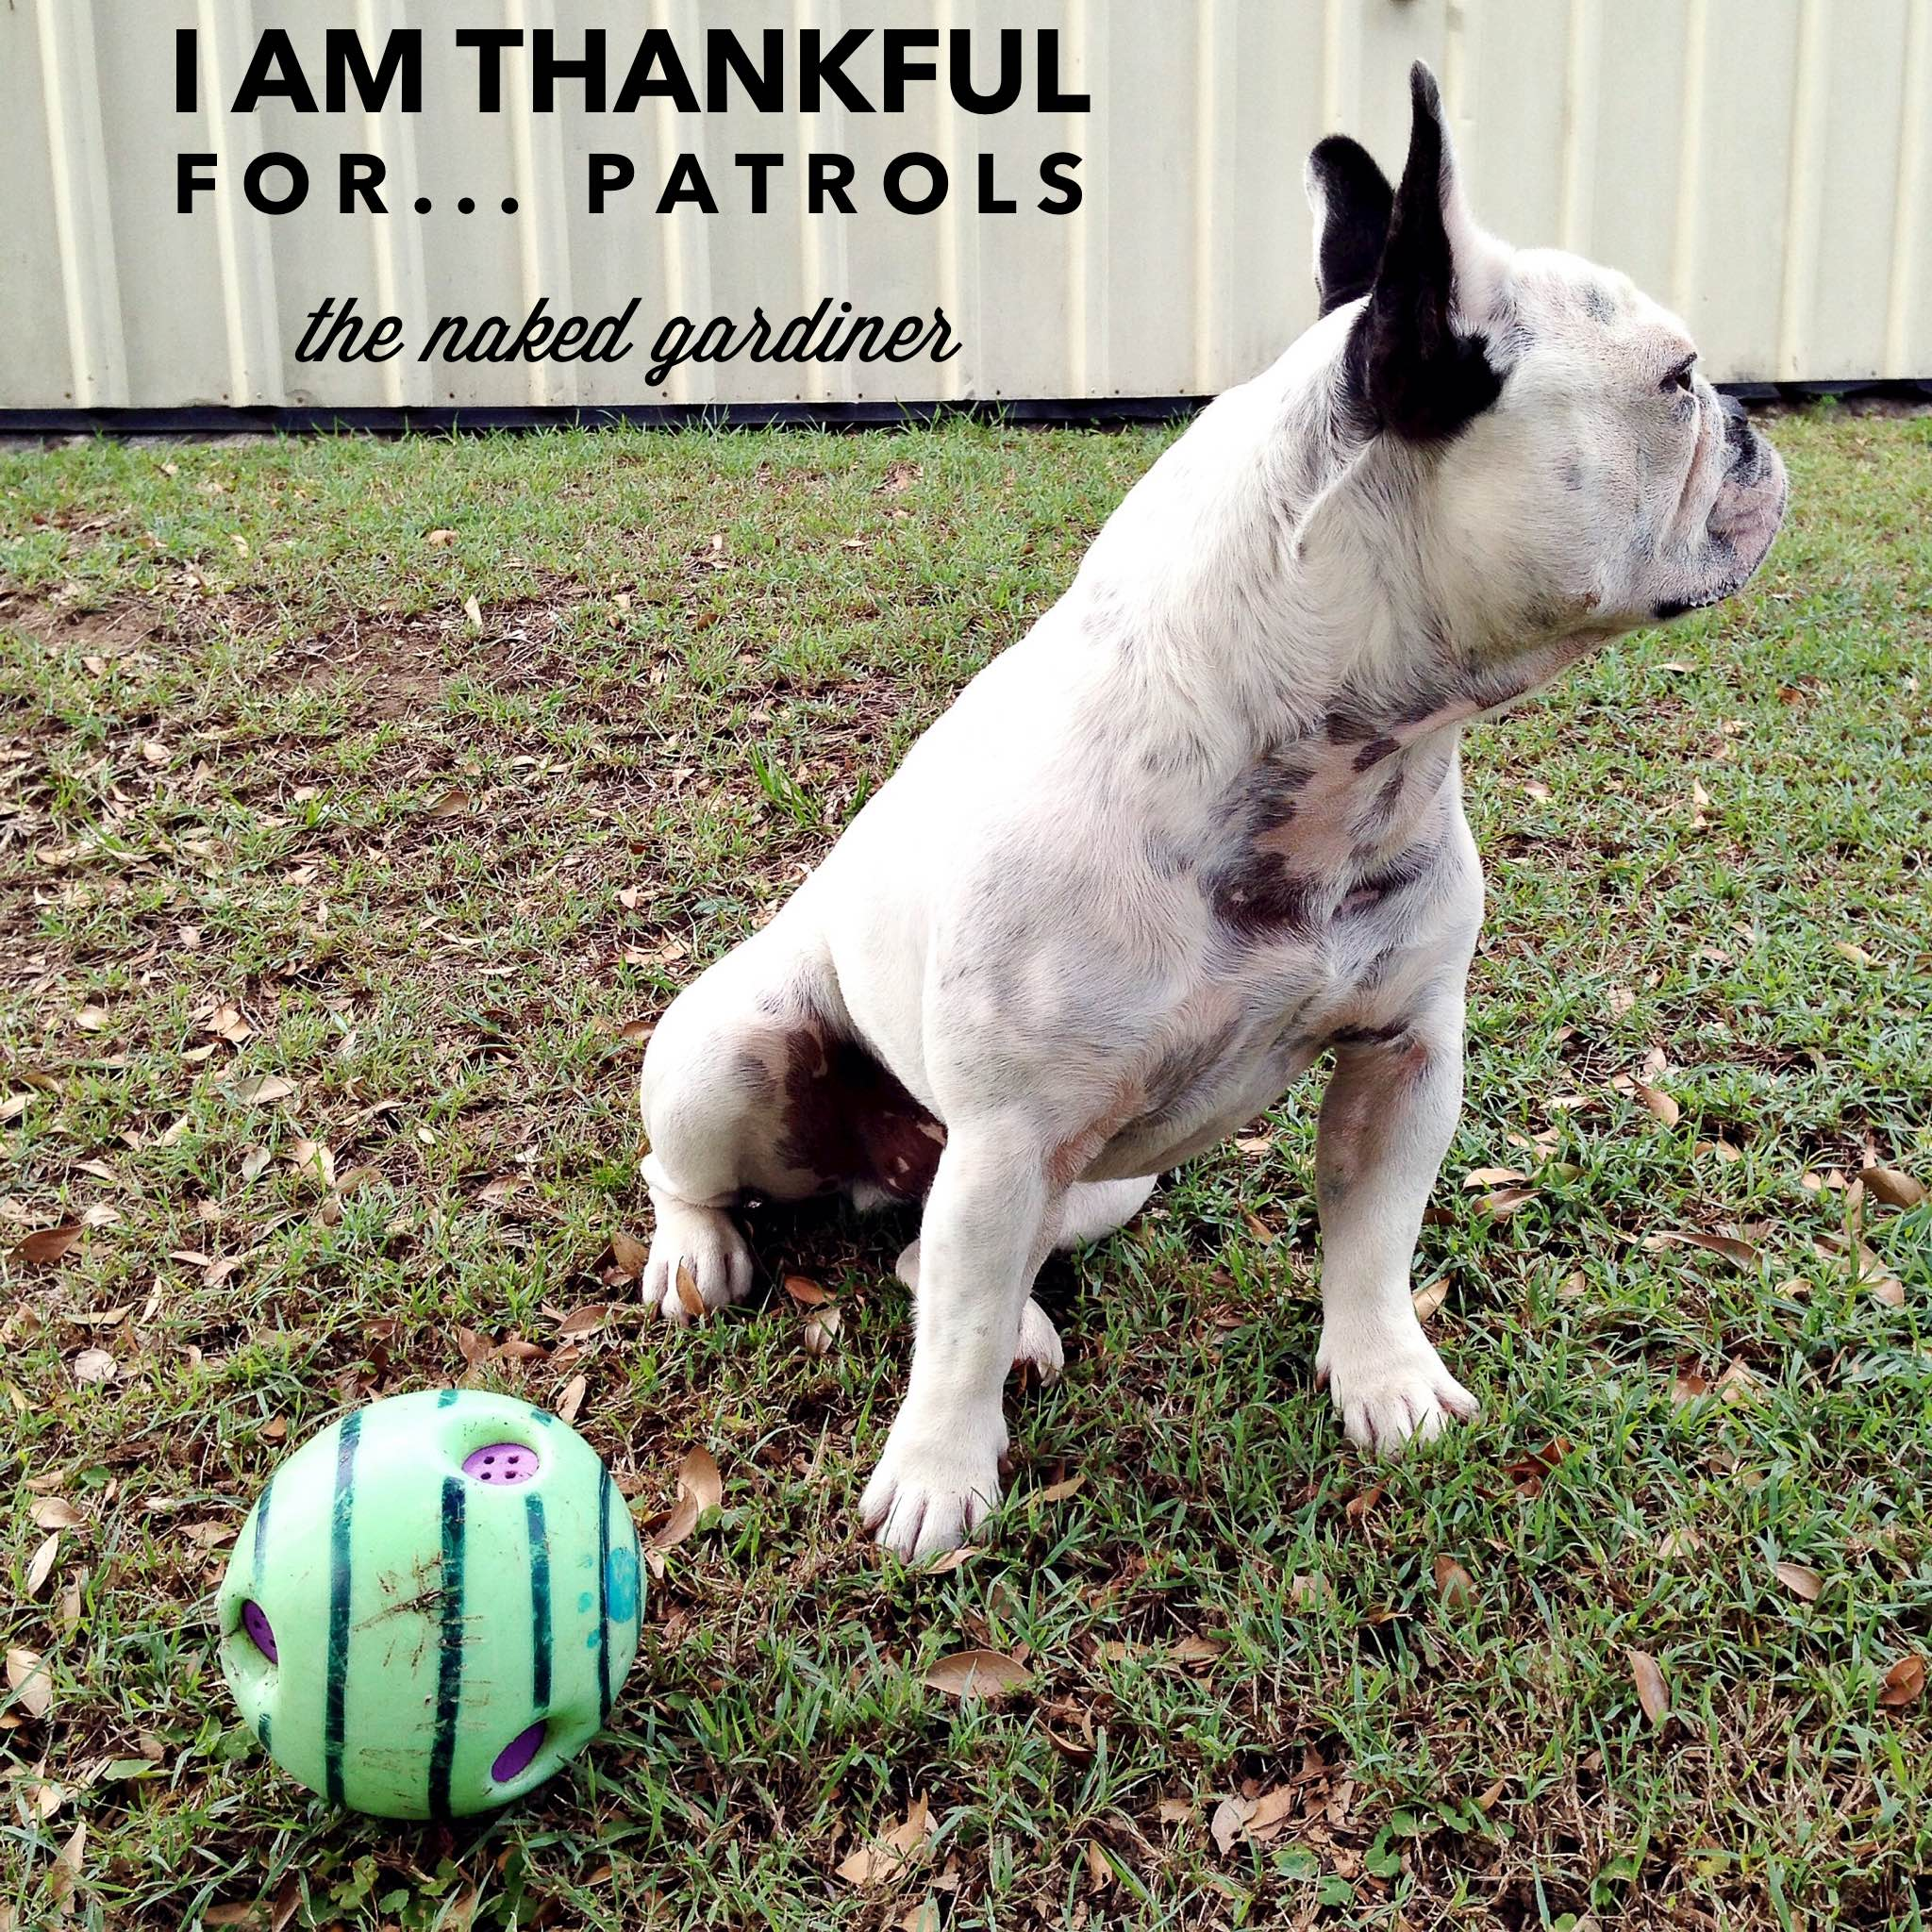 thankful-thursdays-patrols-thenakedgardiner